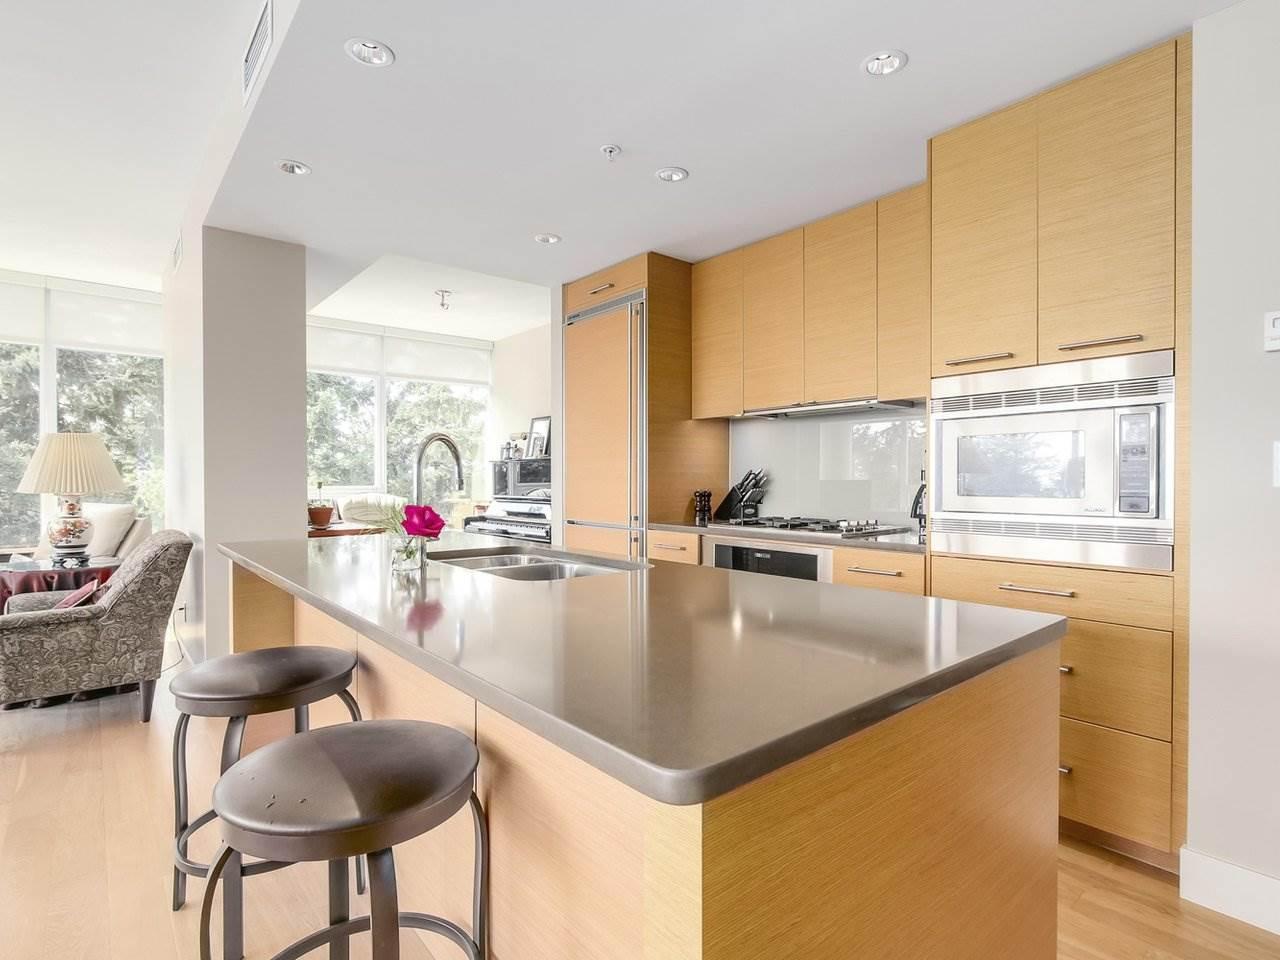 Condo Apartment at 802 15152 RUSSELL AVENUE, Unit 802, South Surrey White Rock, British Columbia. Image 7